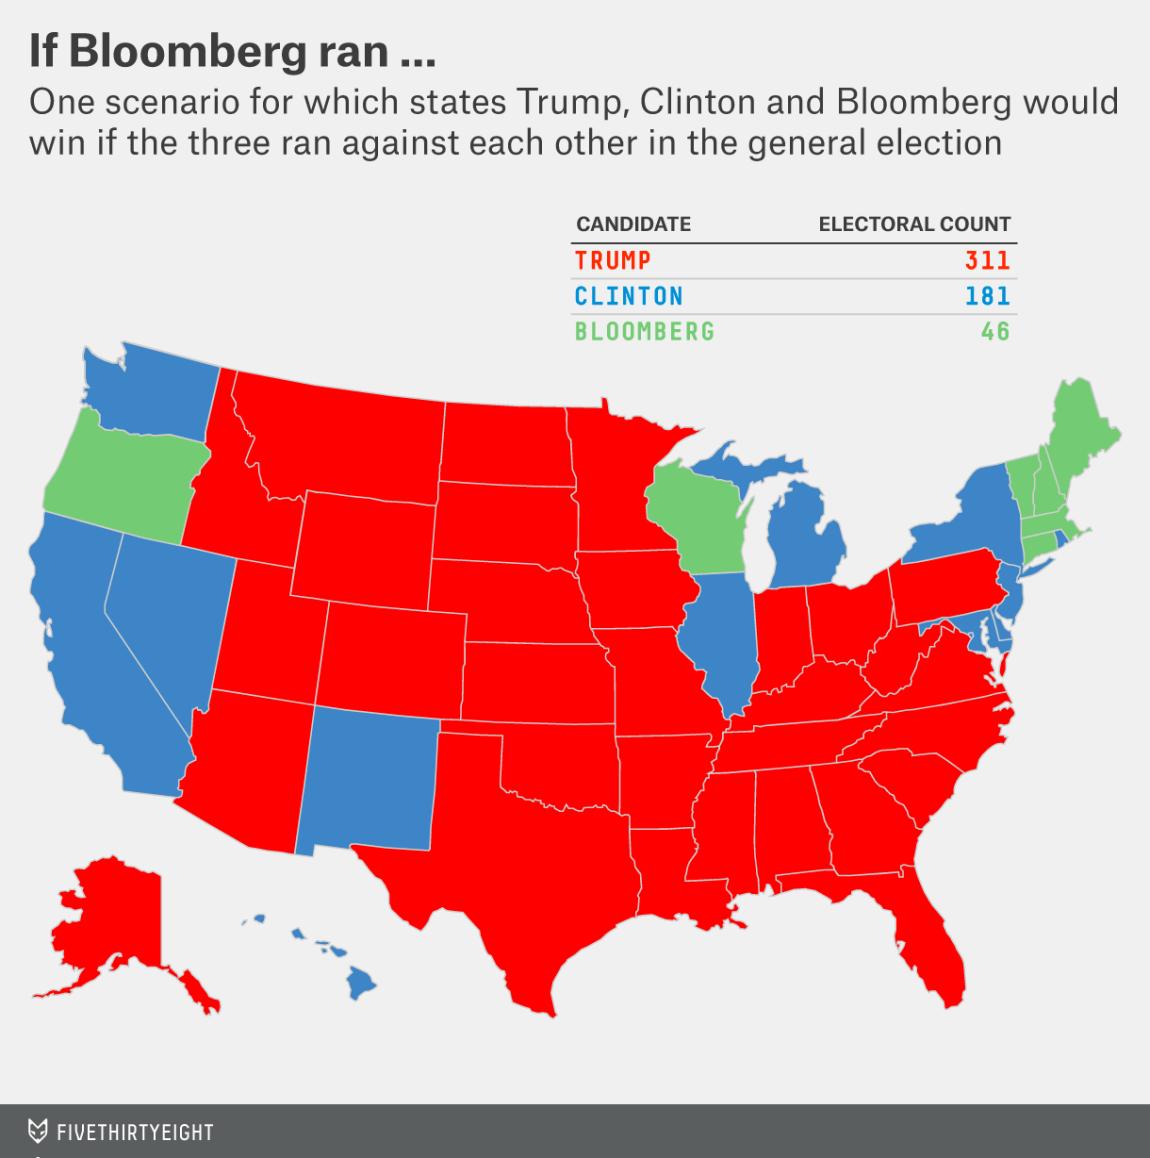 If Bloomberg ran, Election Night 2016